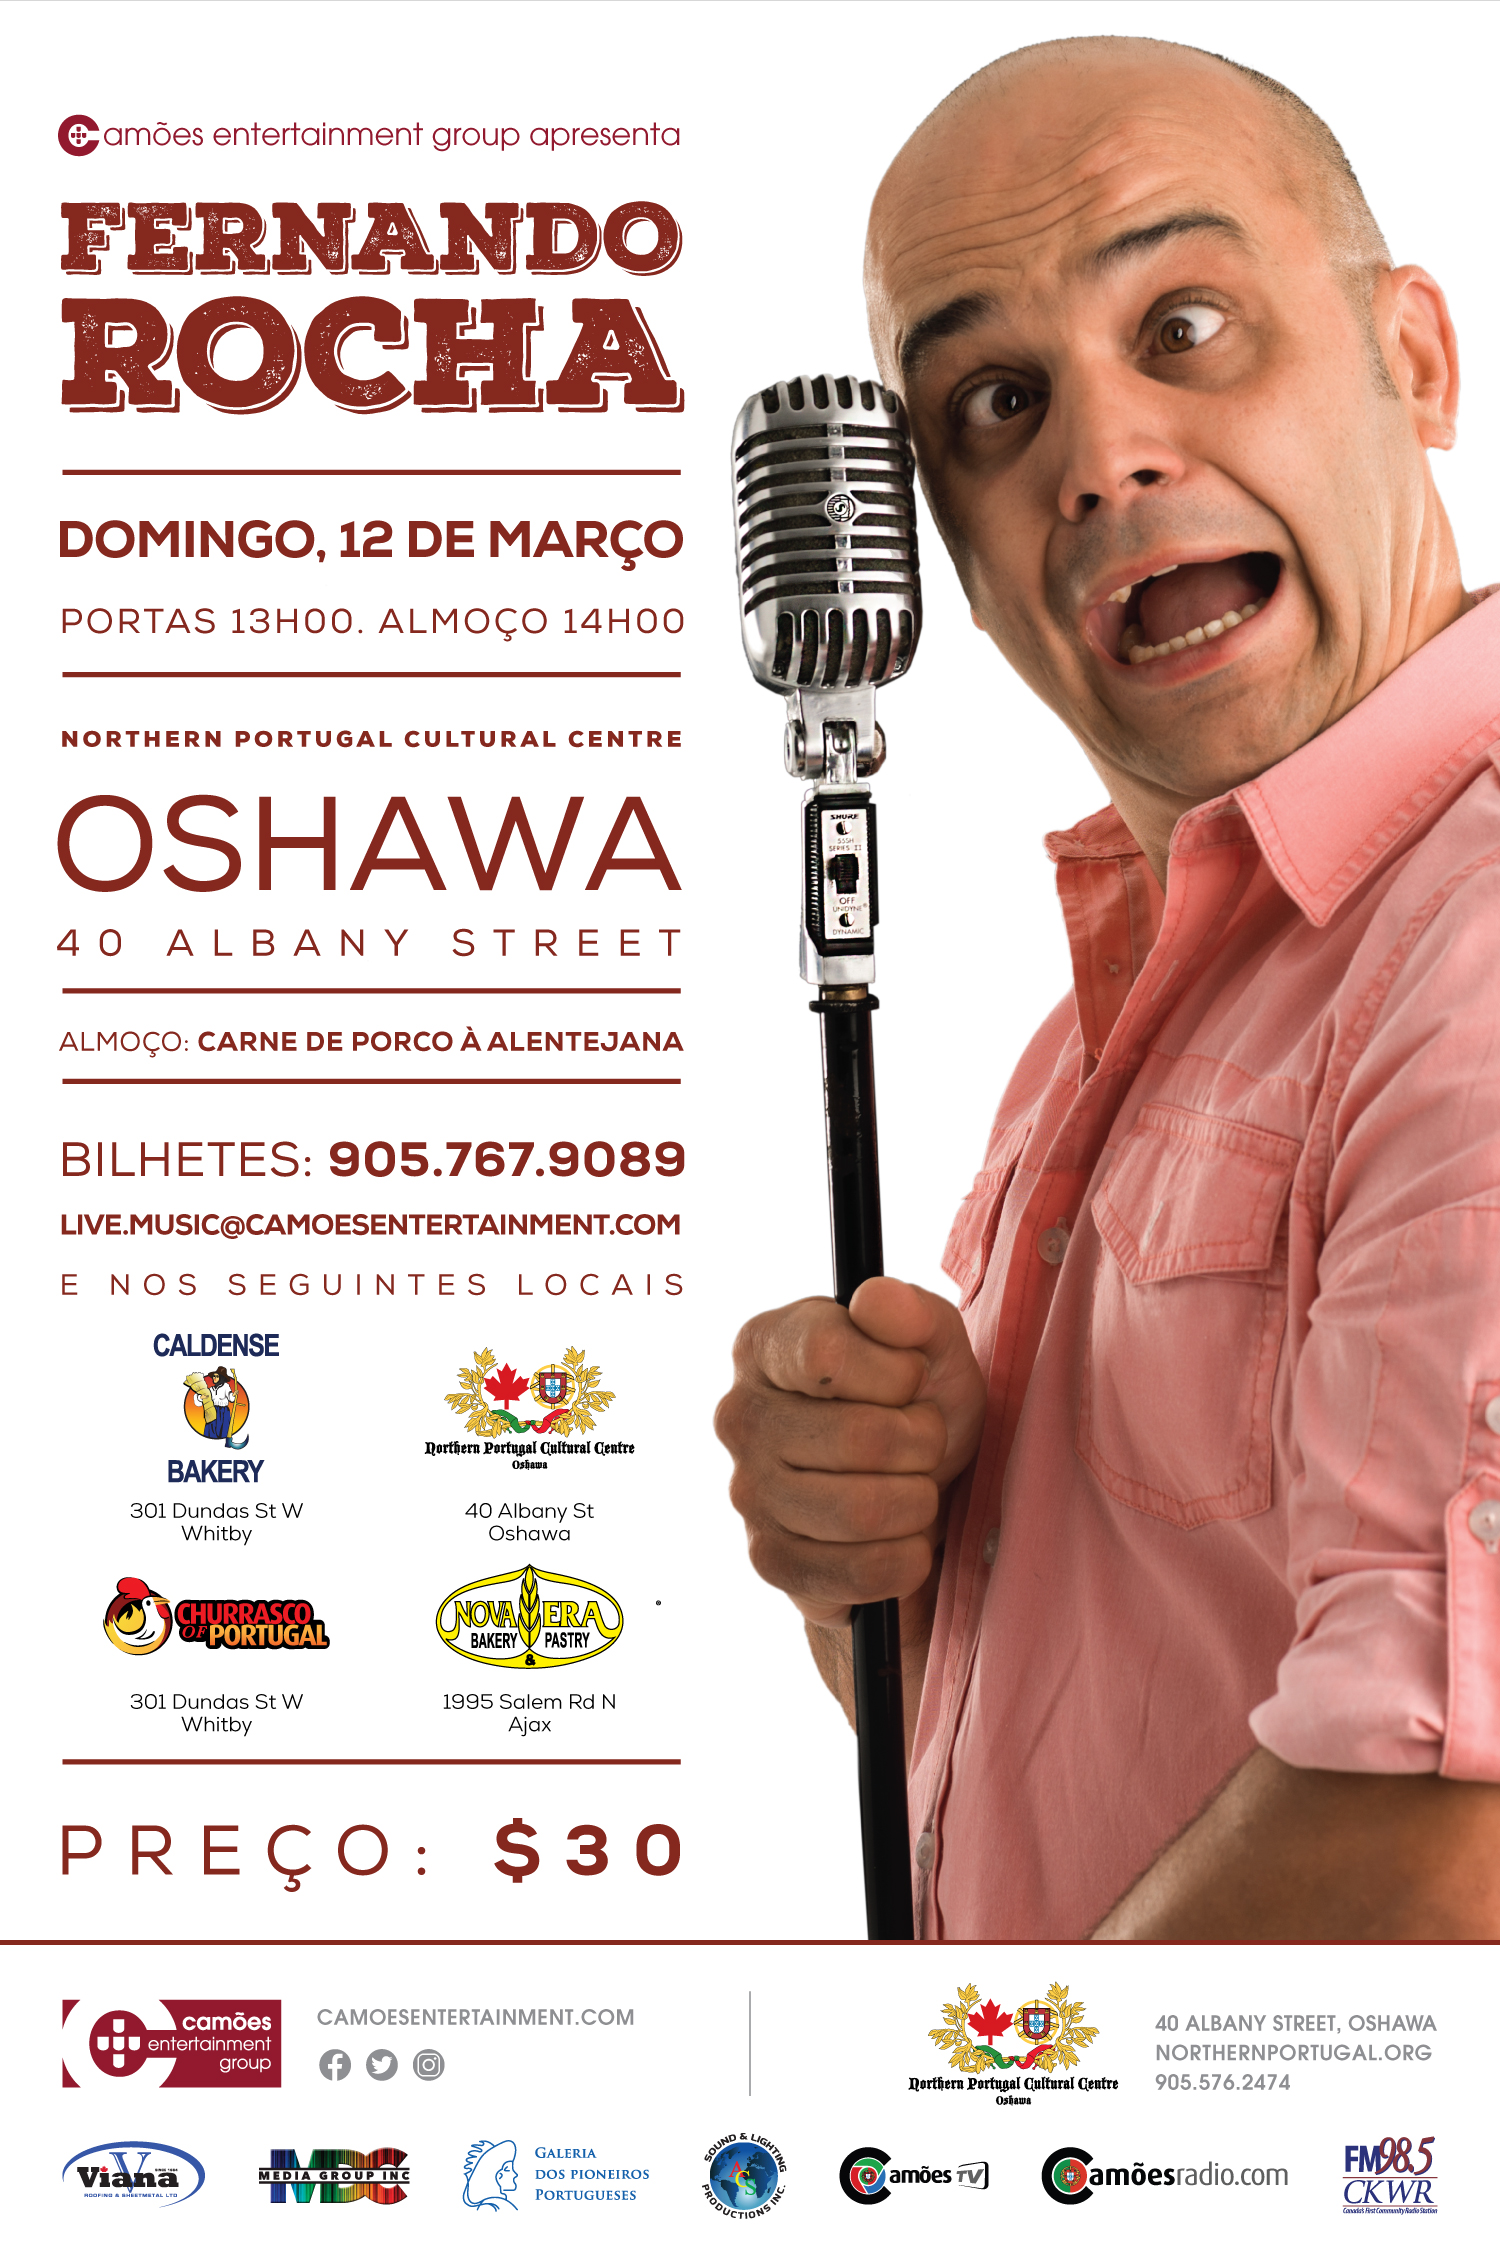 Fernando Rocha poster